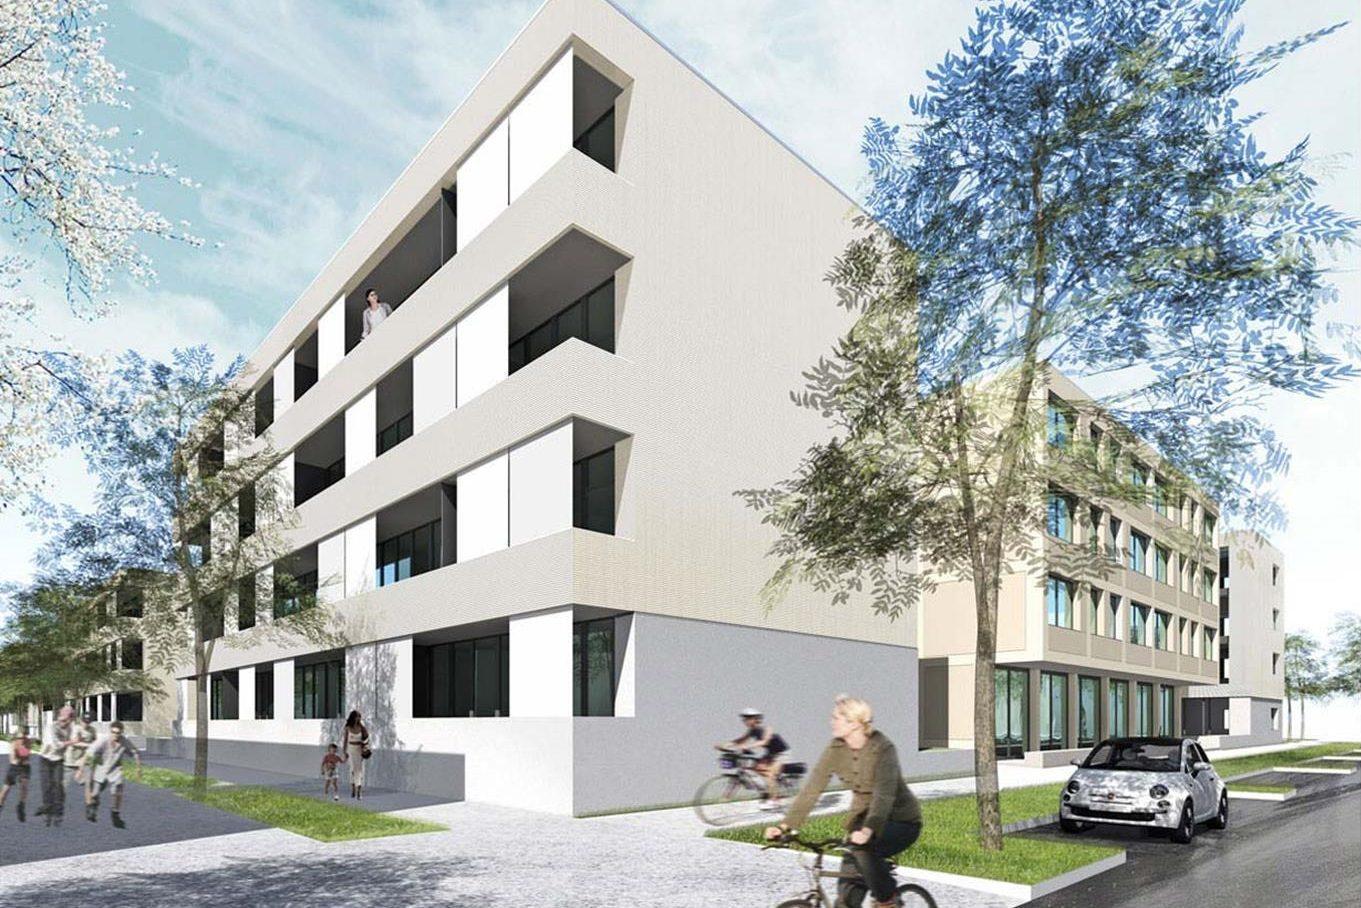 Newtonprojekt Büro - 1.0 Berlin Fliesendesign